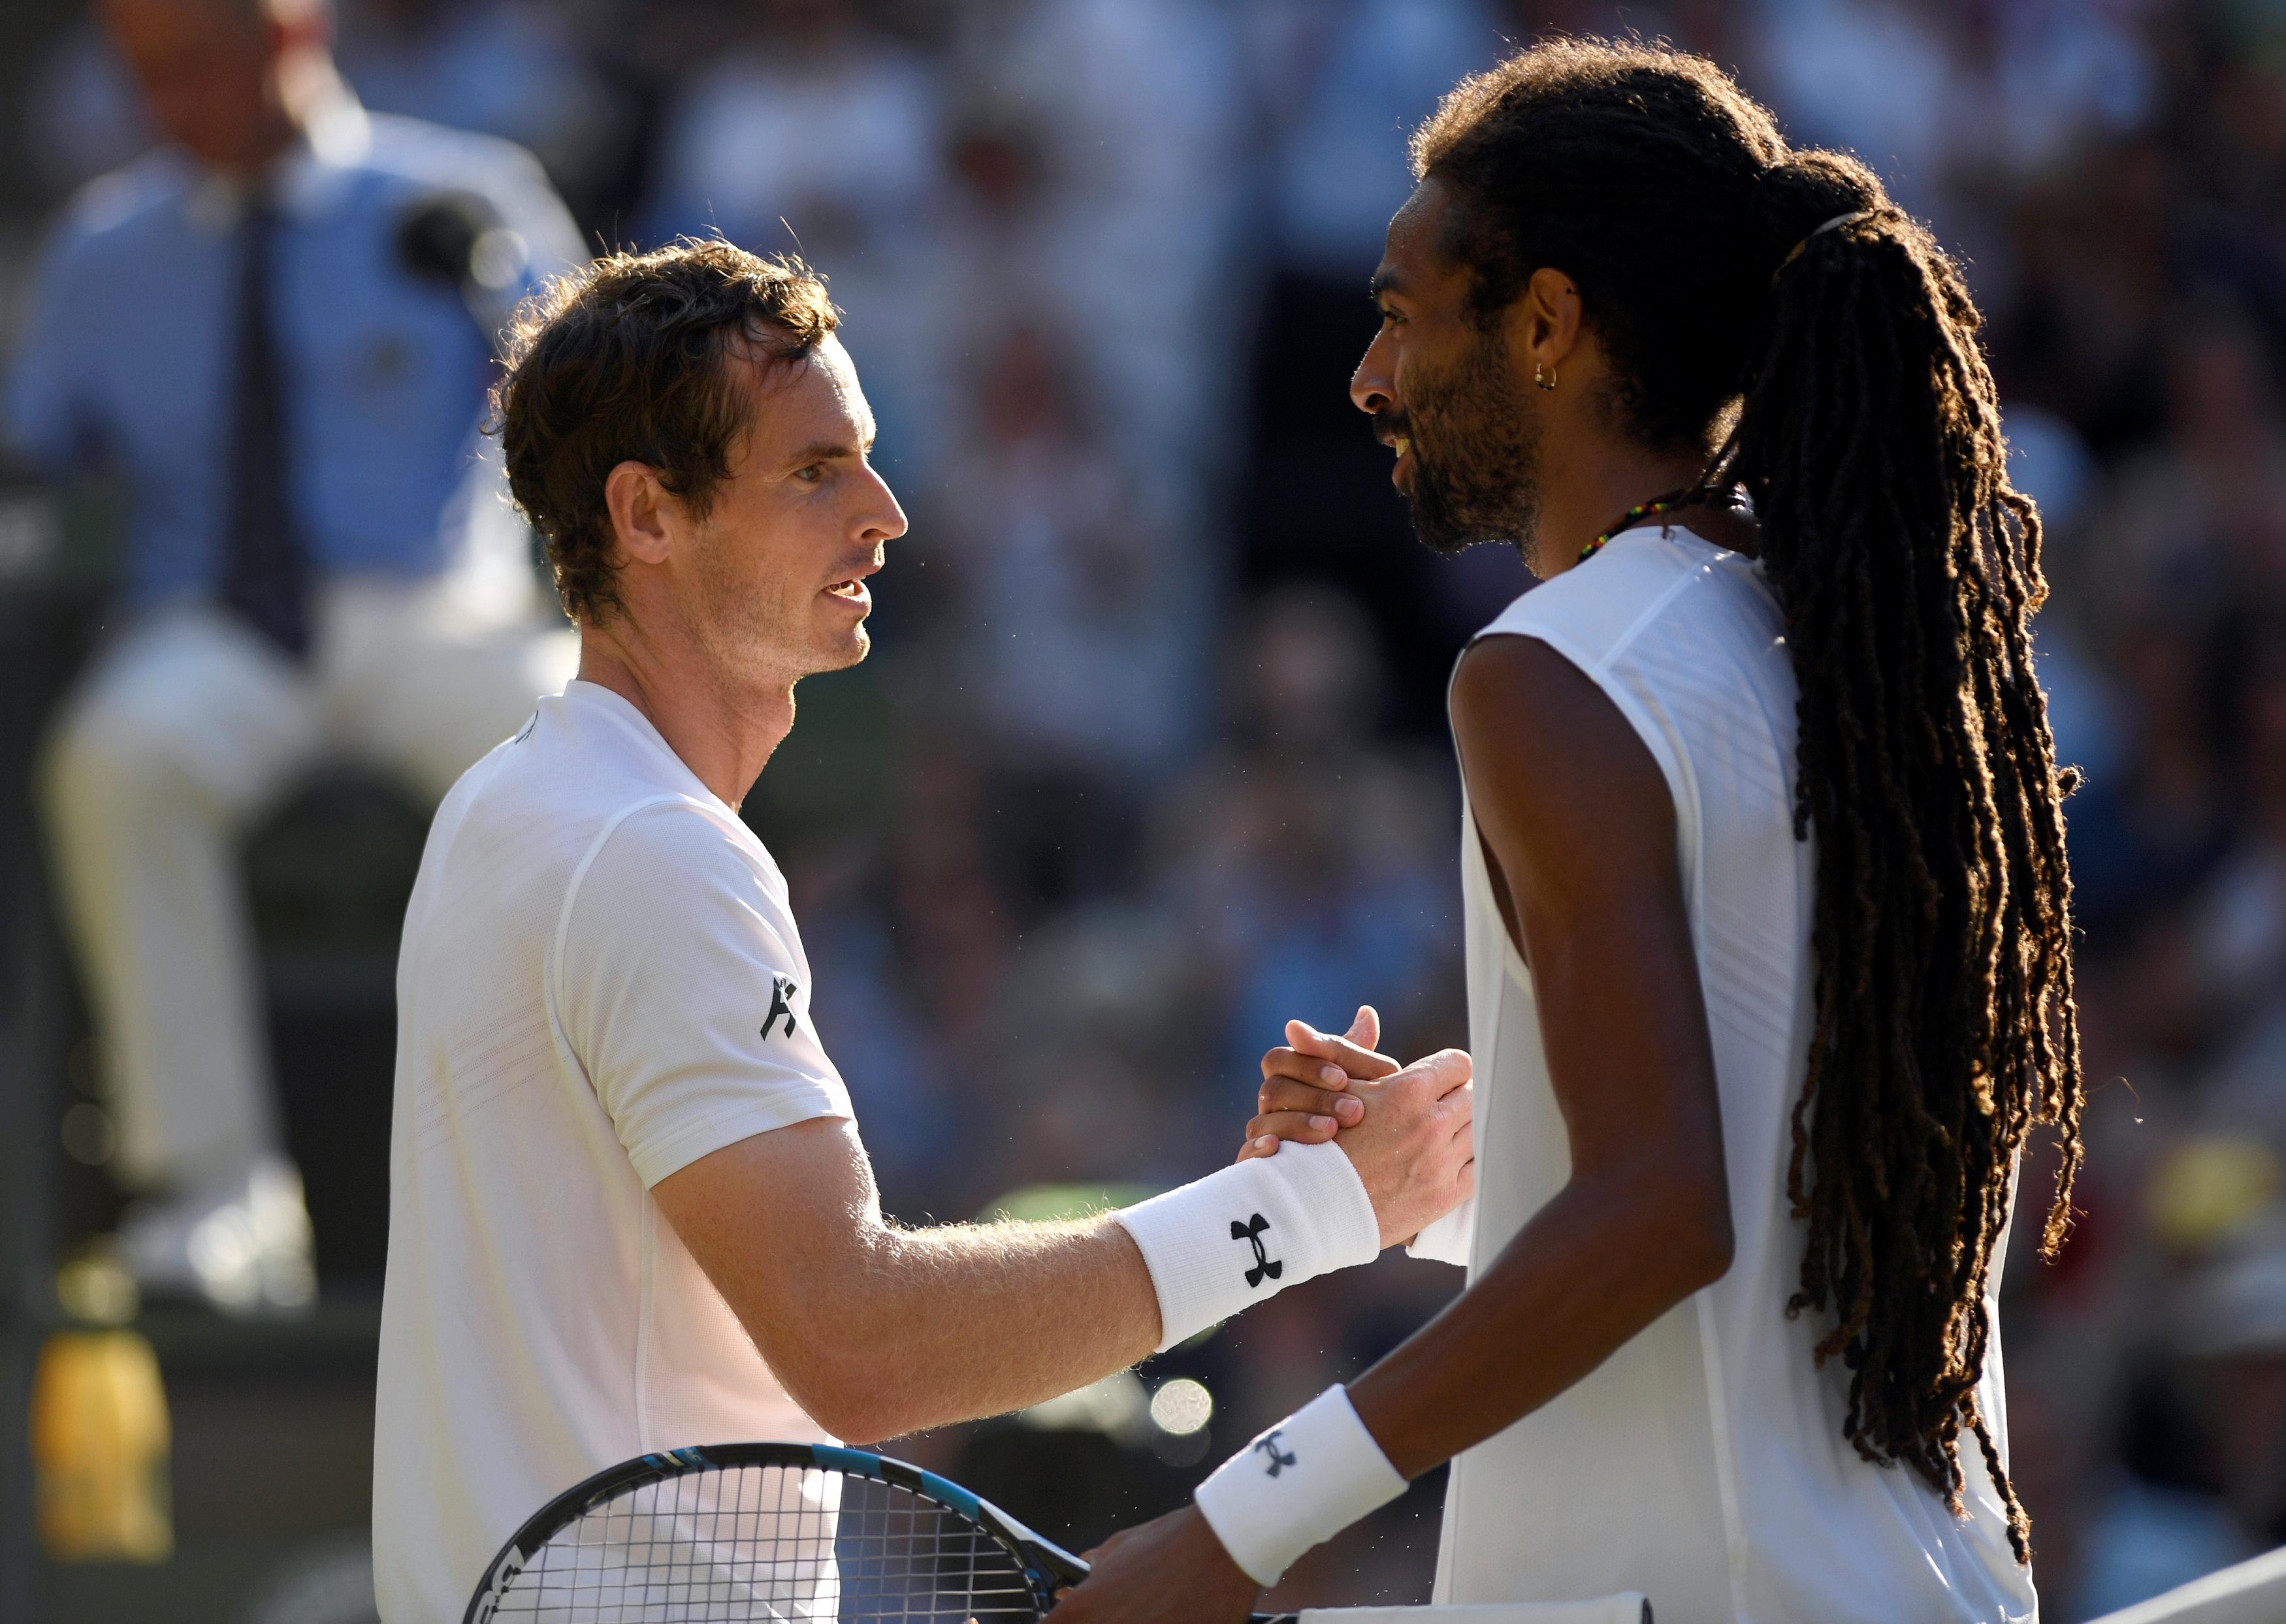 Tennis: Ruthless Murray outclasses dangerous Brown at Wimbledon